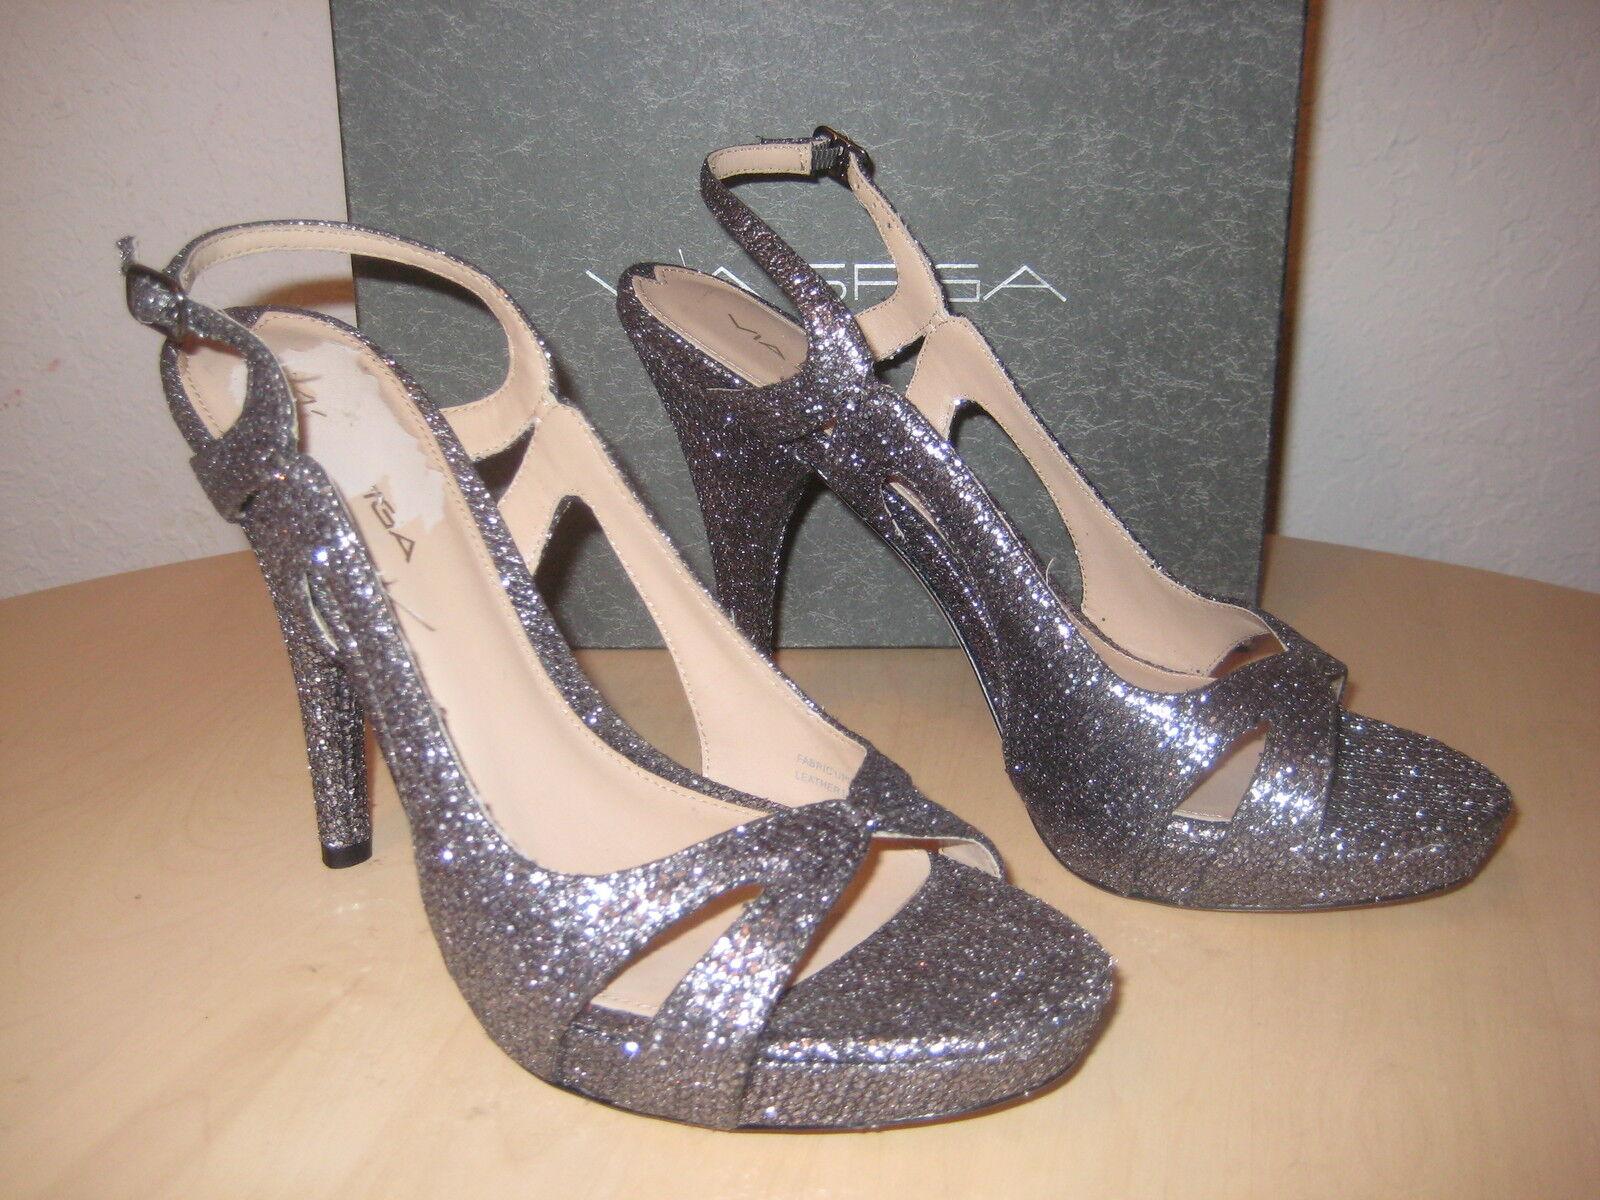 Via Spiga Schuhes Größe 8 M Damenschuhe NEU Adrianna 2 Silver Sparkly Open Toe Heels